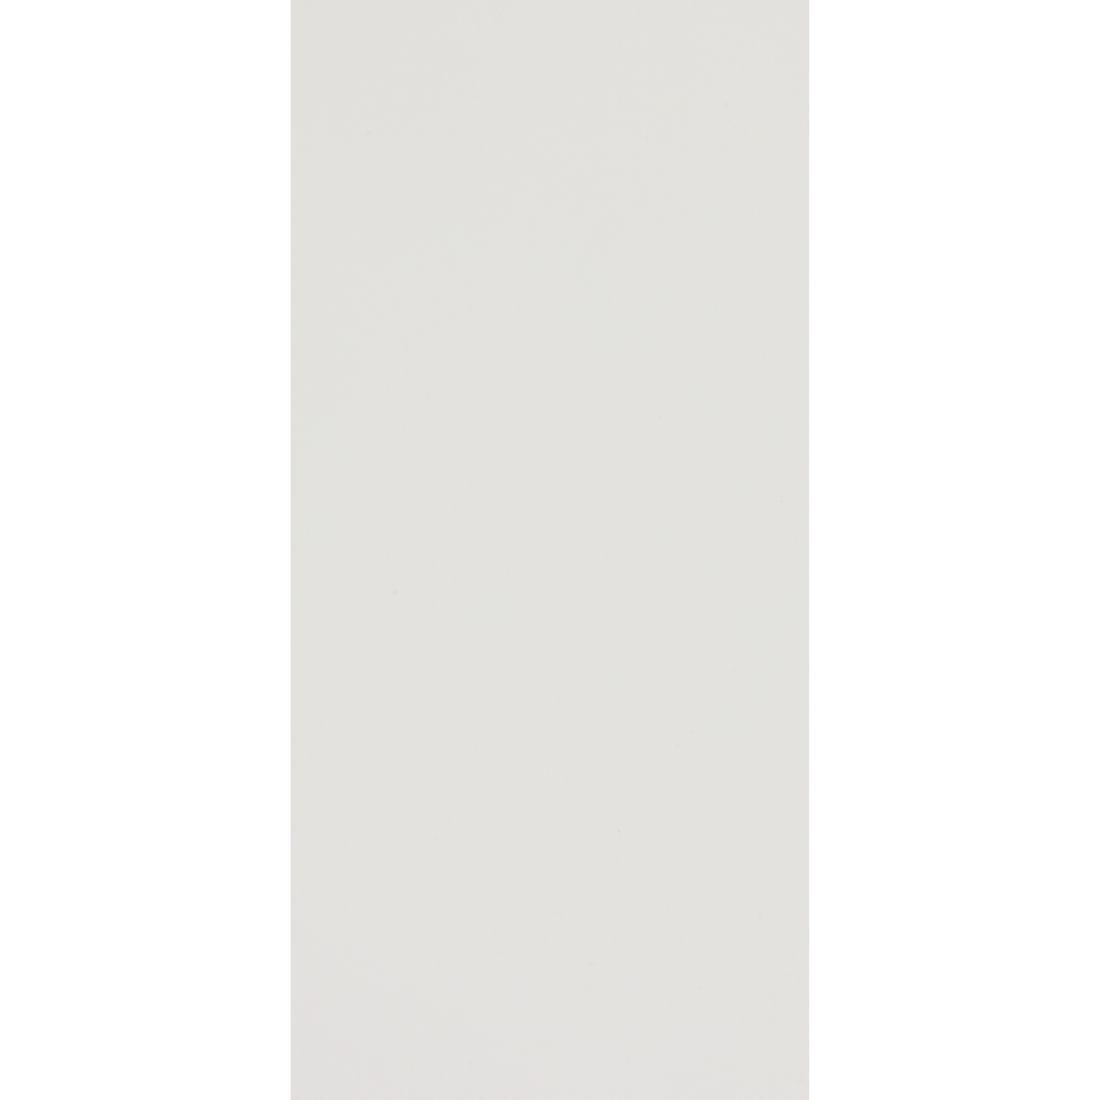 Classic Wall Lining Panel Toitoi Gloss 2400 x 1200 x 4.5mm